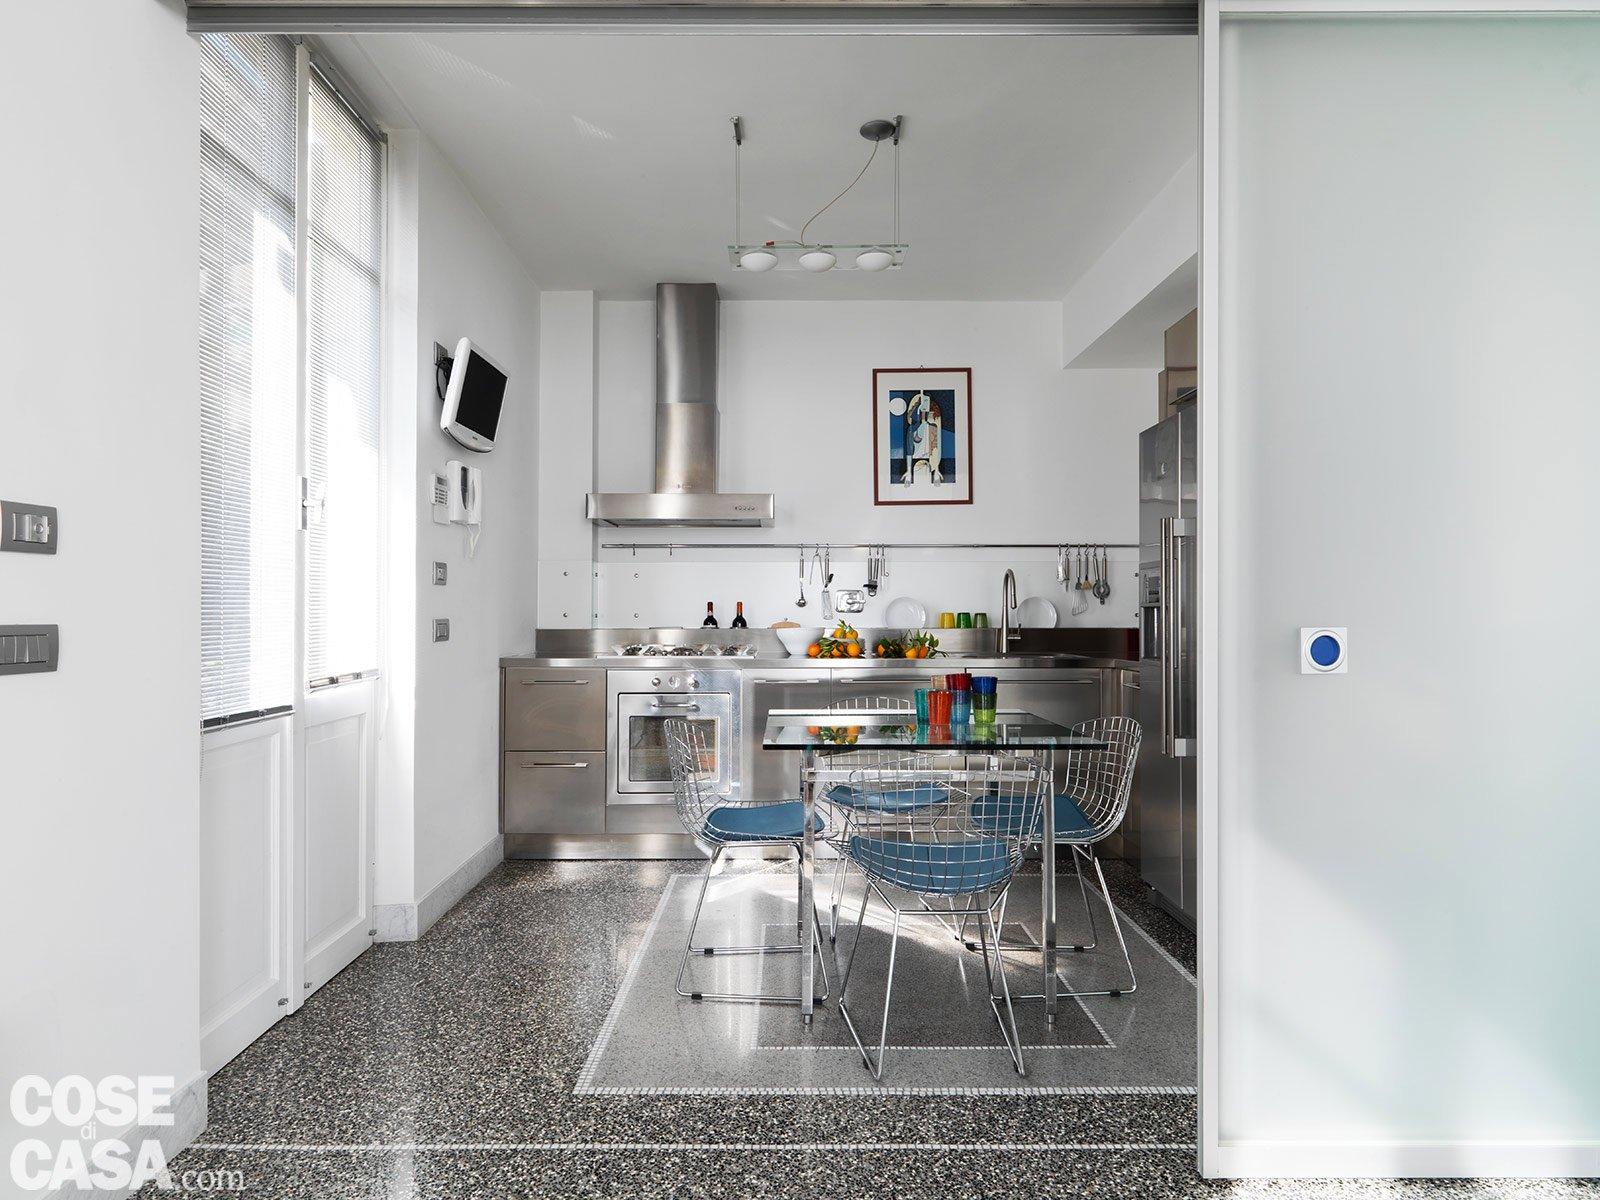 Casa soluzioni hi tech per interni anni 39 30 cose di casa - Pavimento per cucina ...